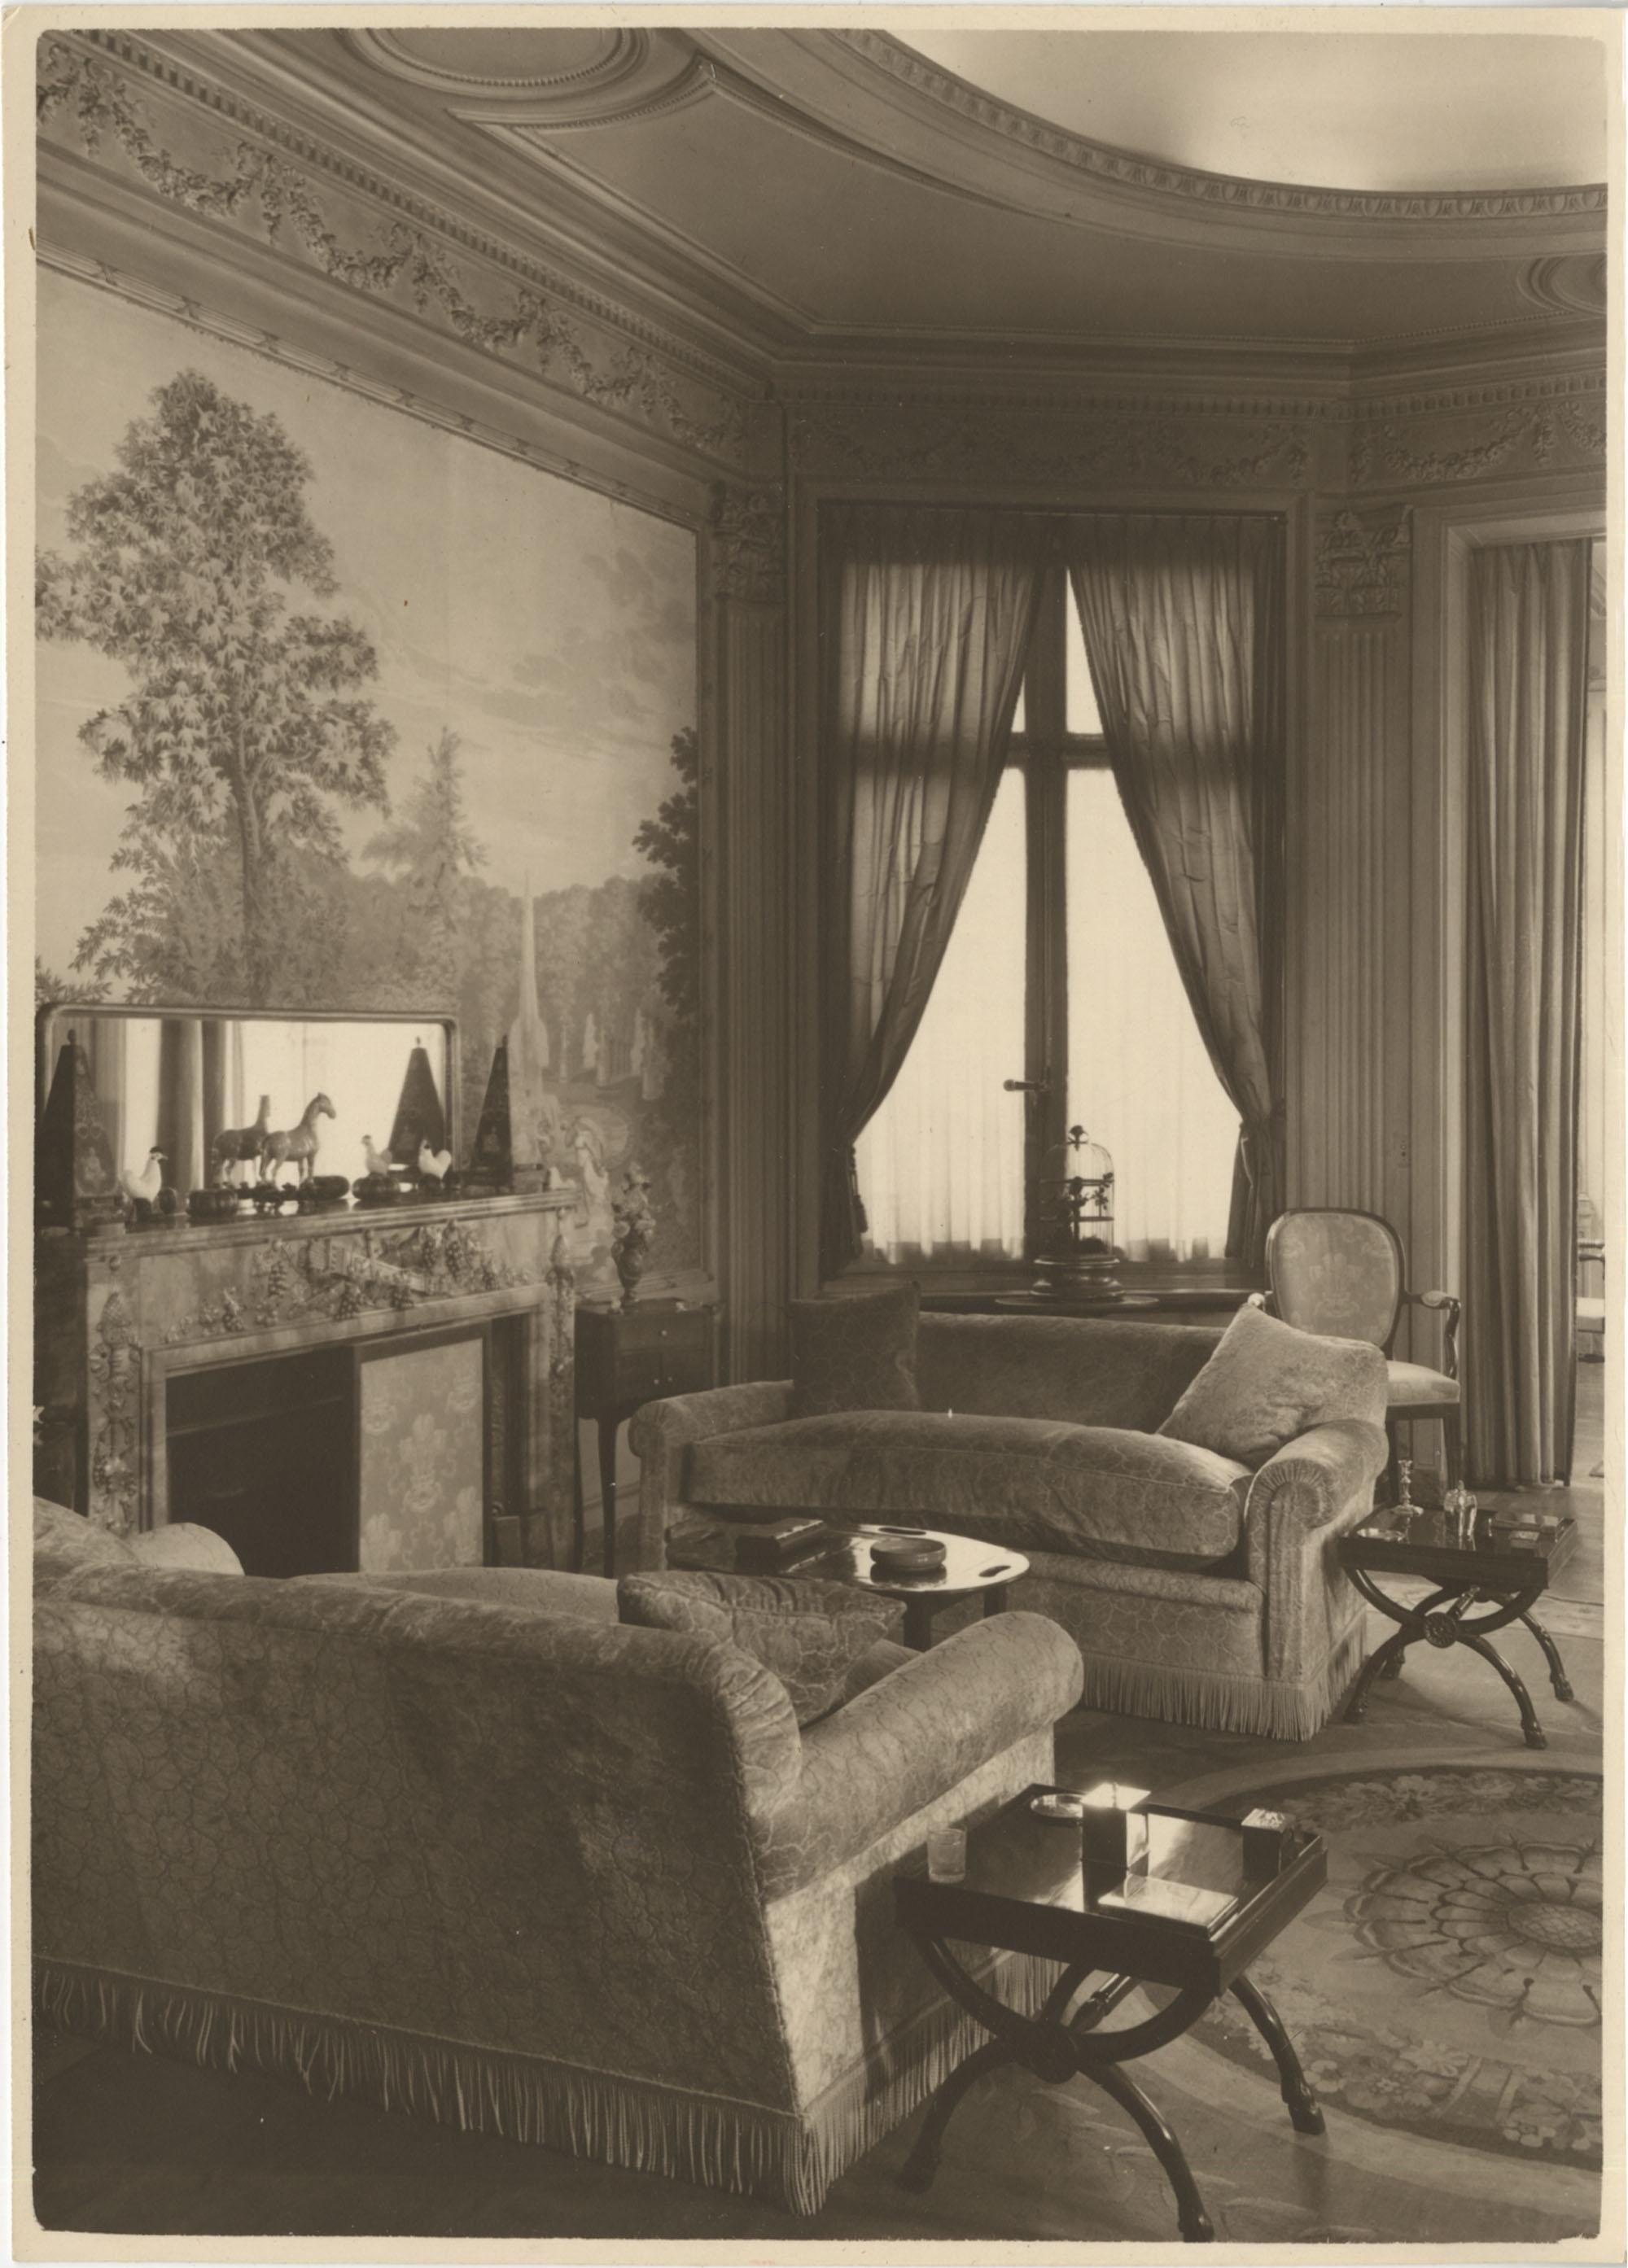 Directoire room' in the Royal Italian Consul in Sri Lanka, Photograph 2